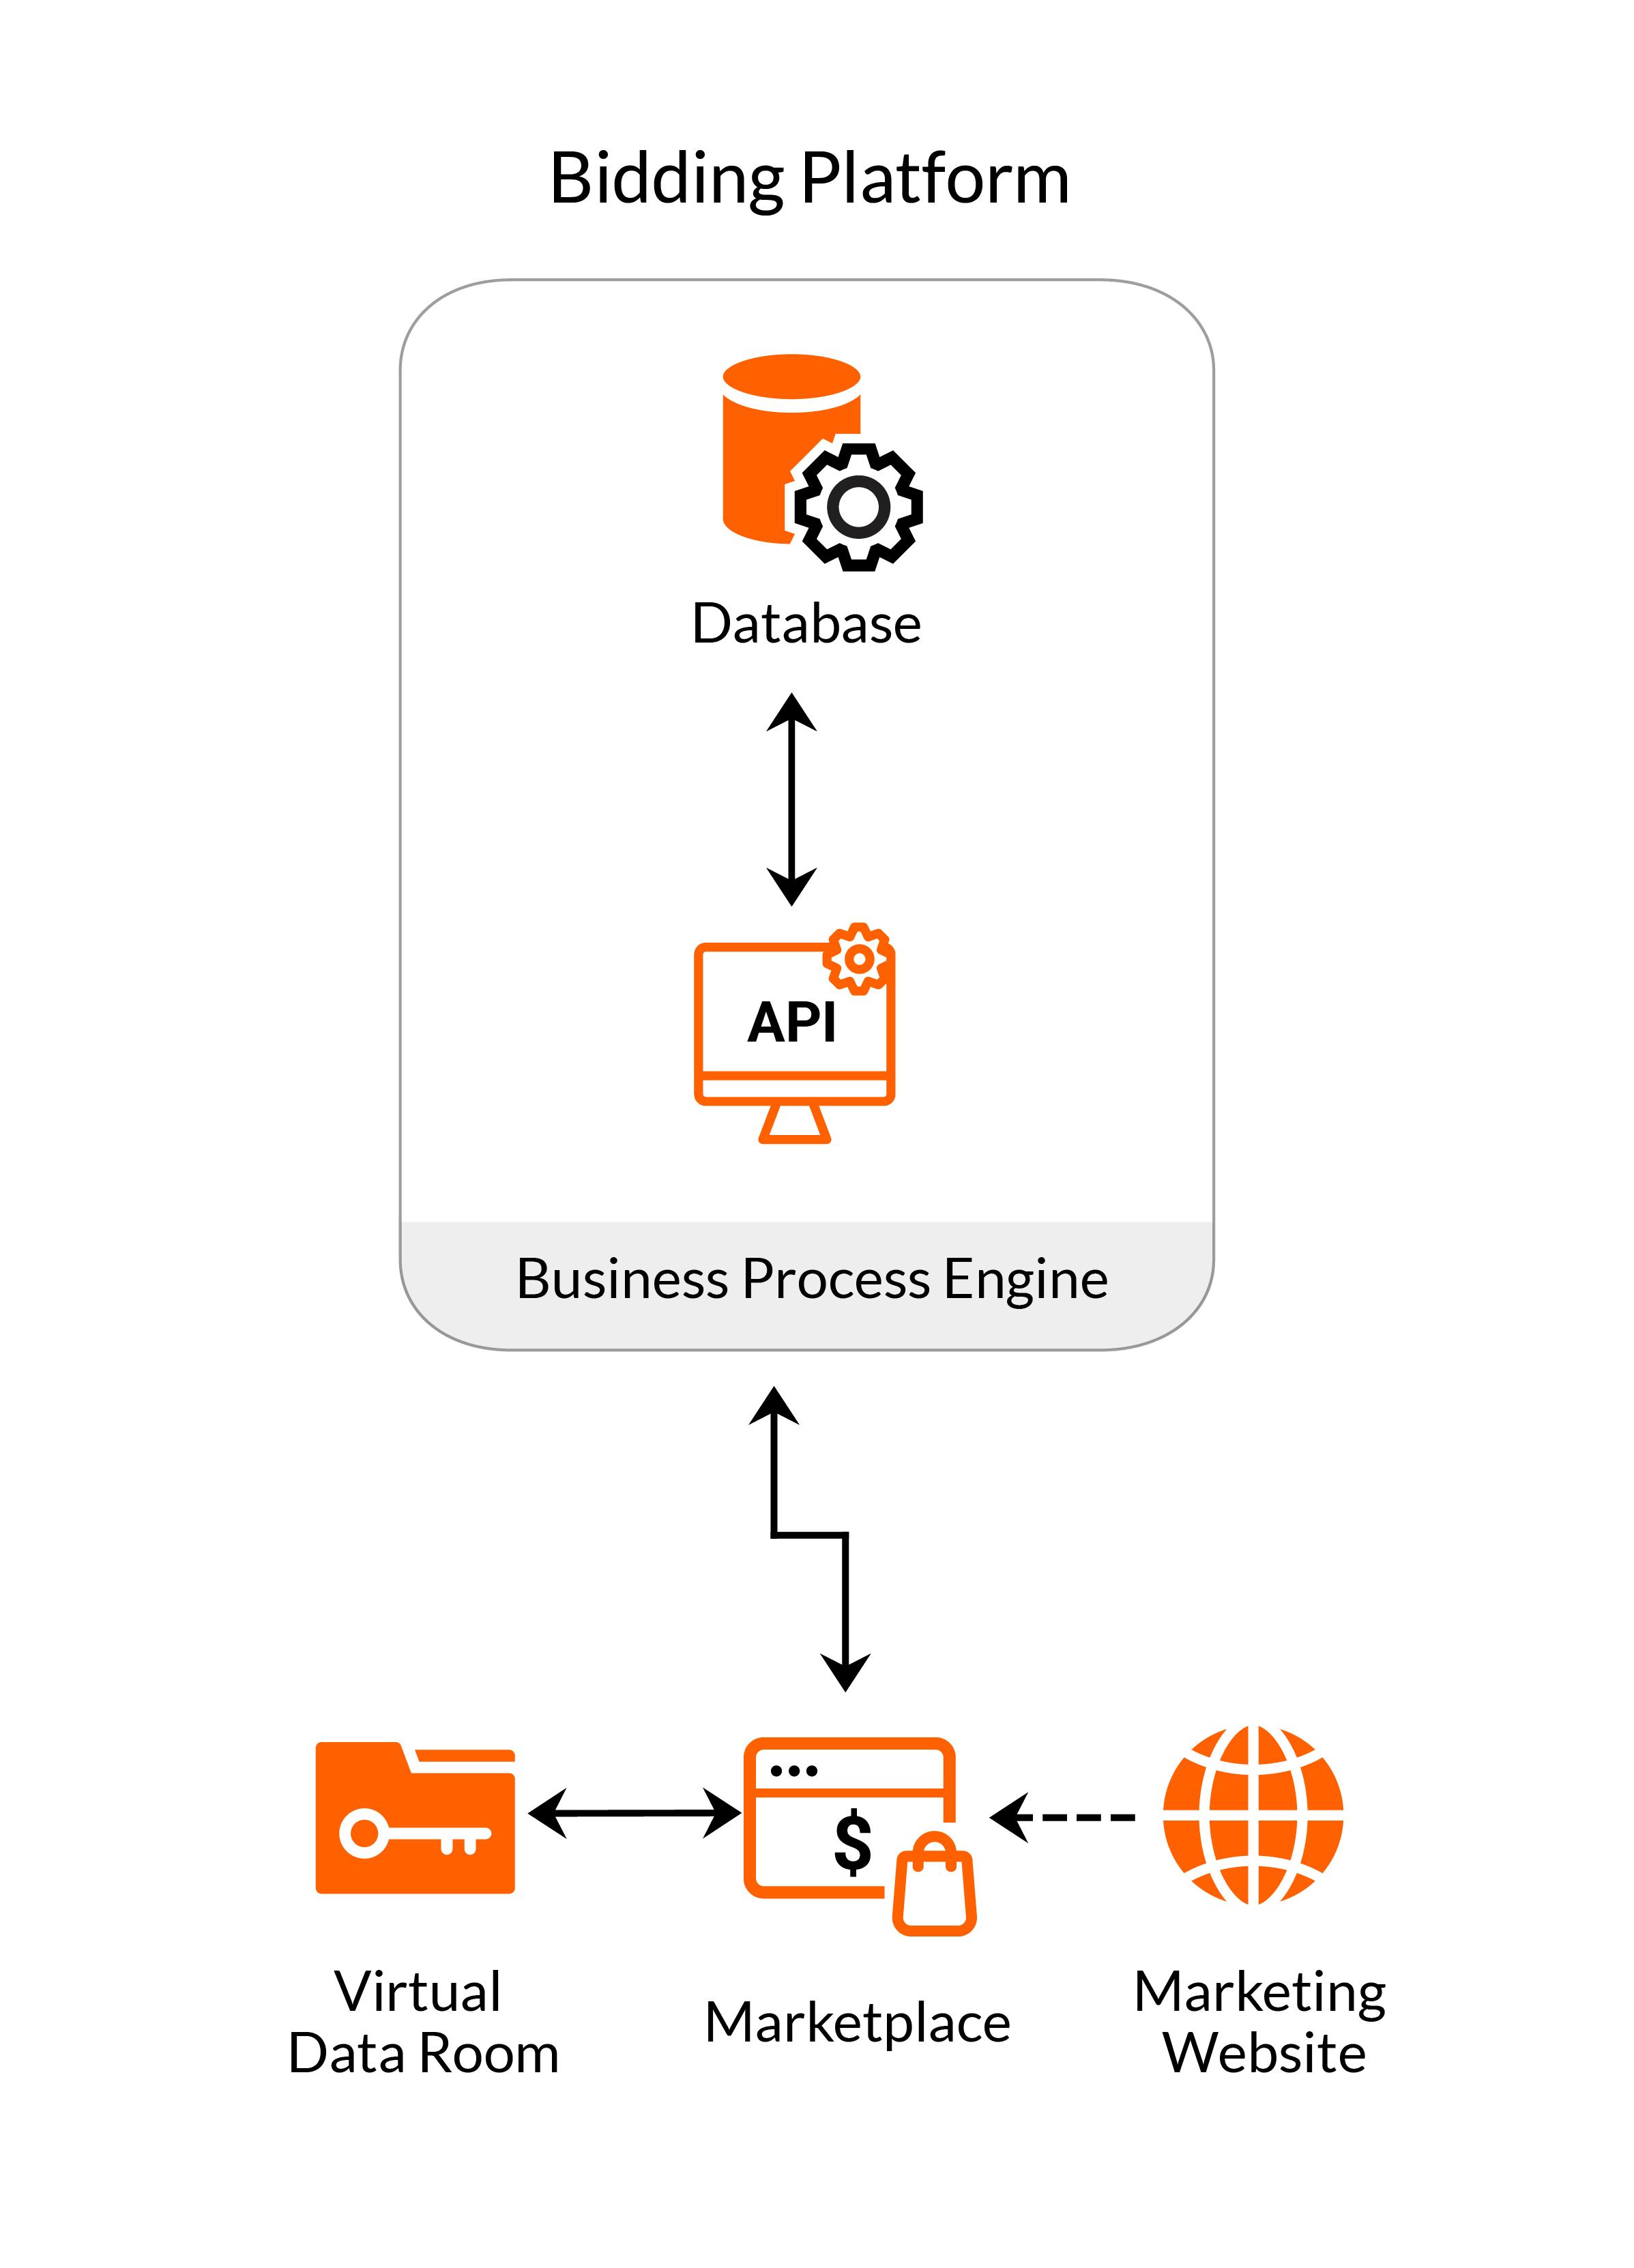 Architecture of a bidding platform